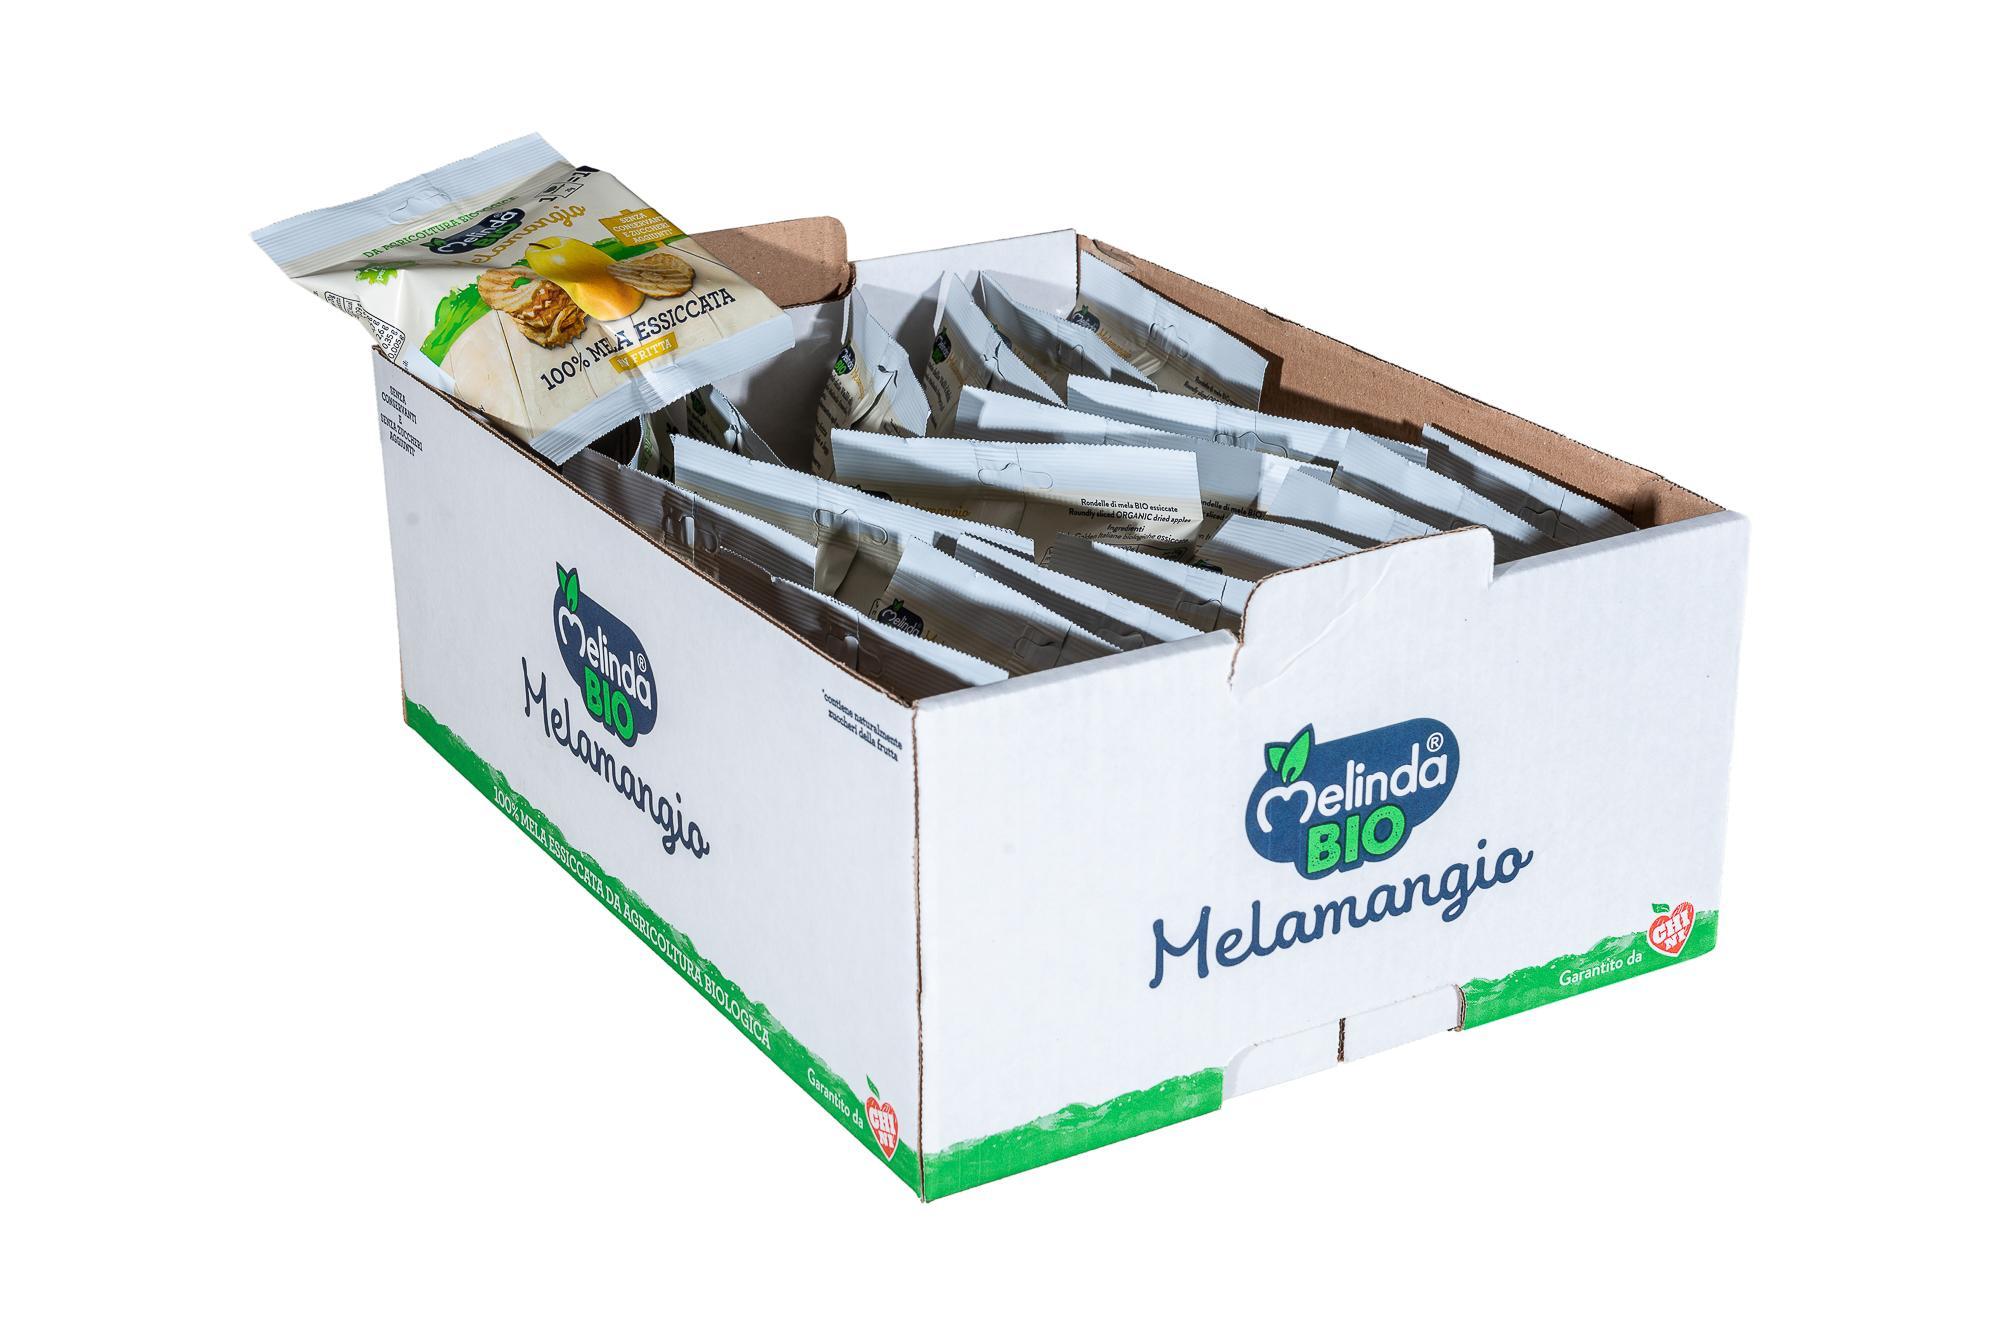 Melamangio Rondelle Melinda Bio – Cartone intero – 21 pz da 20g